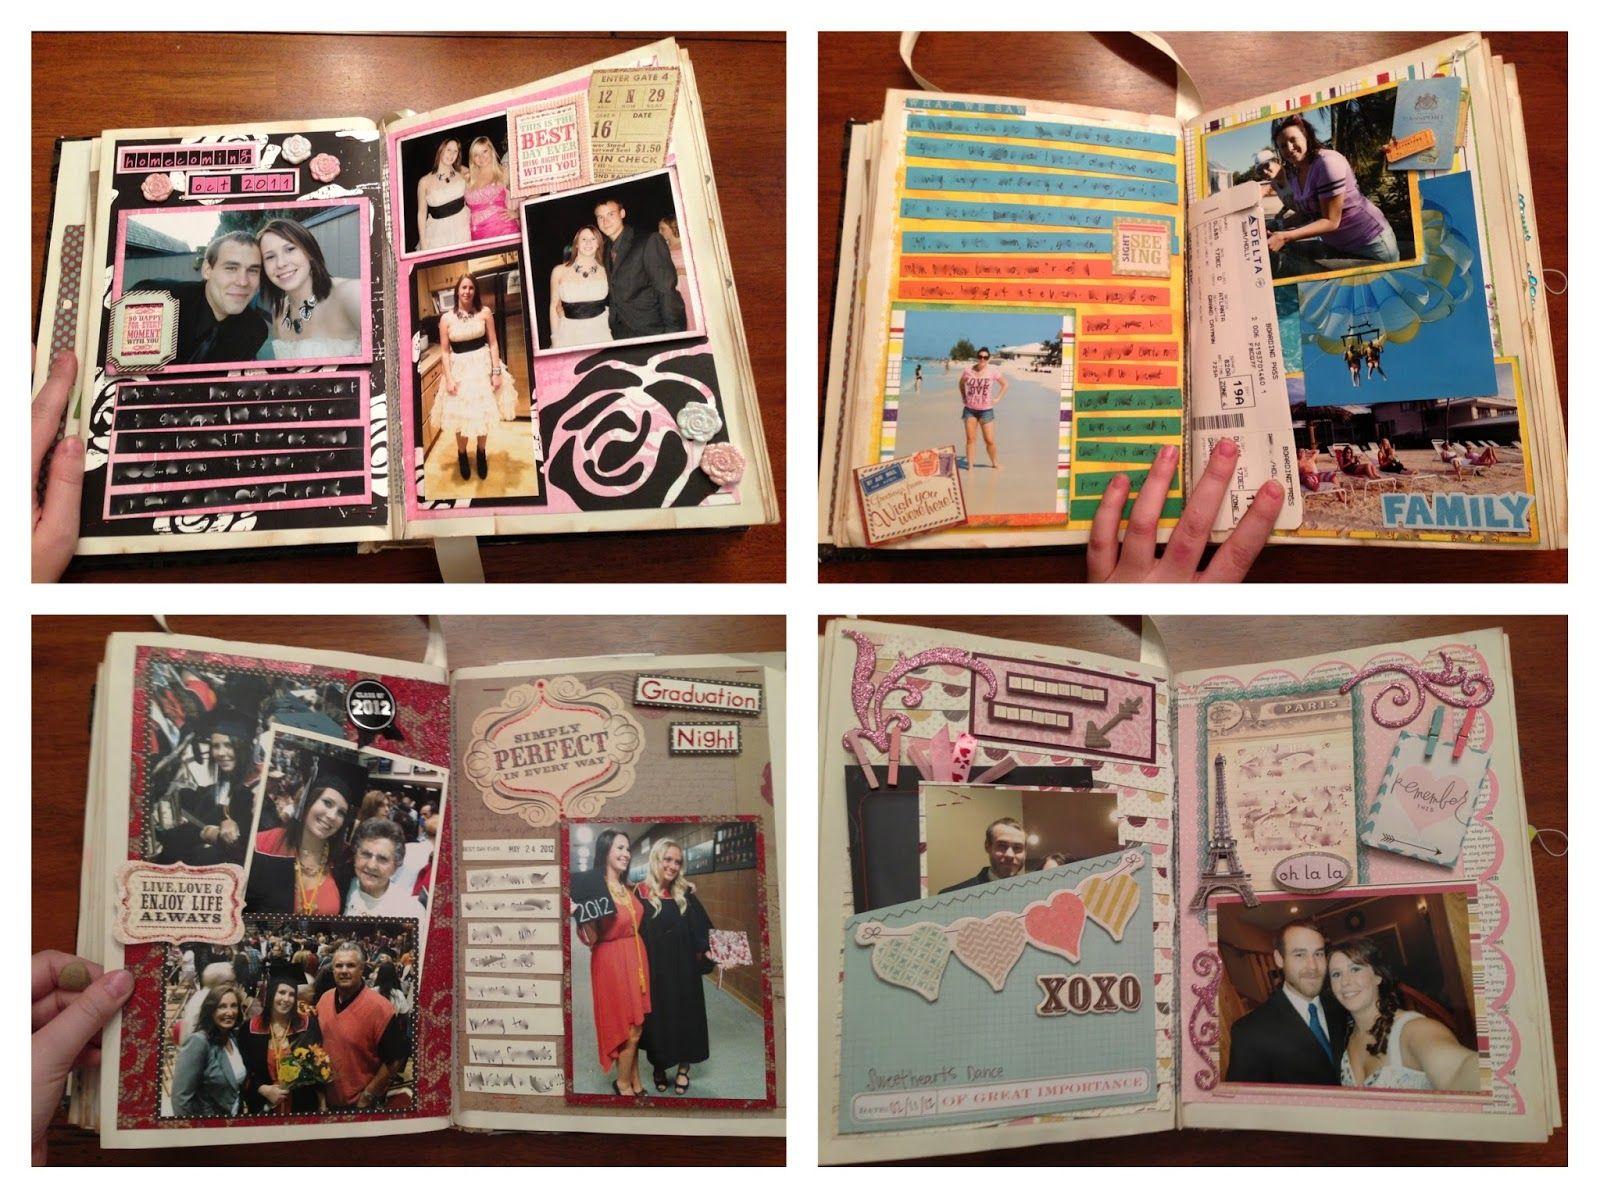 28 Creative Photo Of Best Friend Scrapbook Page Best Friend Scrapbook Page I Solemnly Swear Friend Scrapbook Senior Scrapbook Ideas Scrapbook For Best Friend